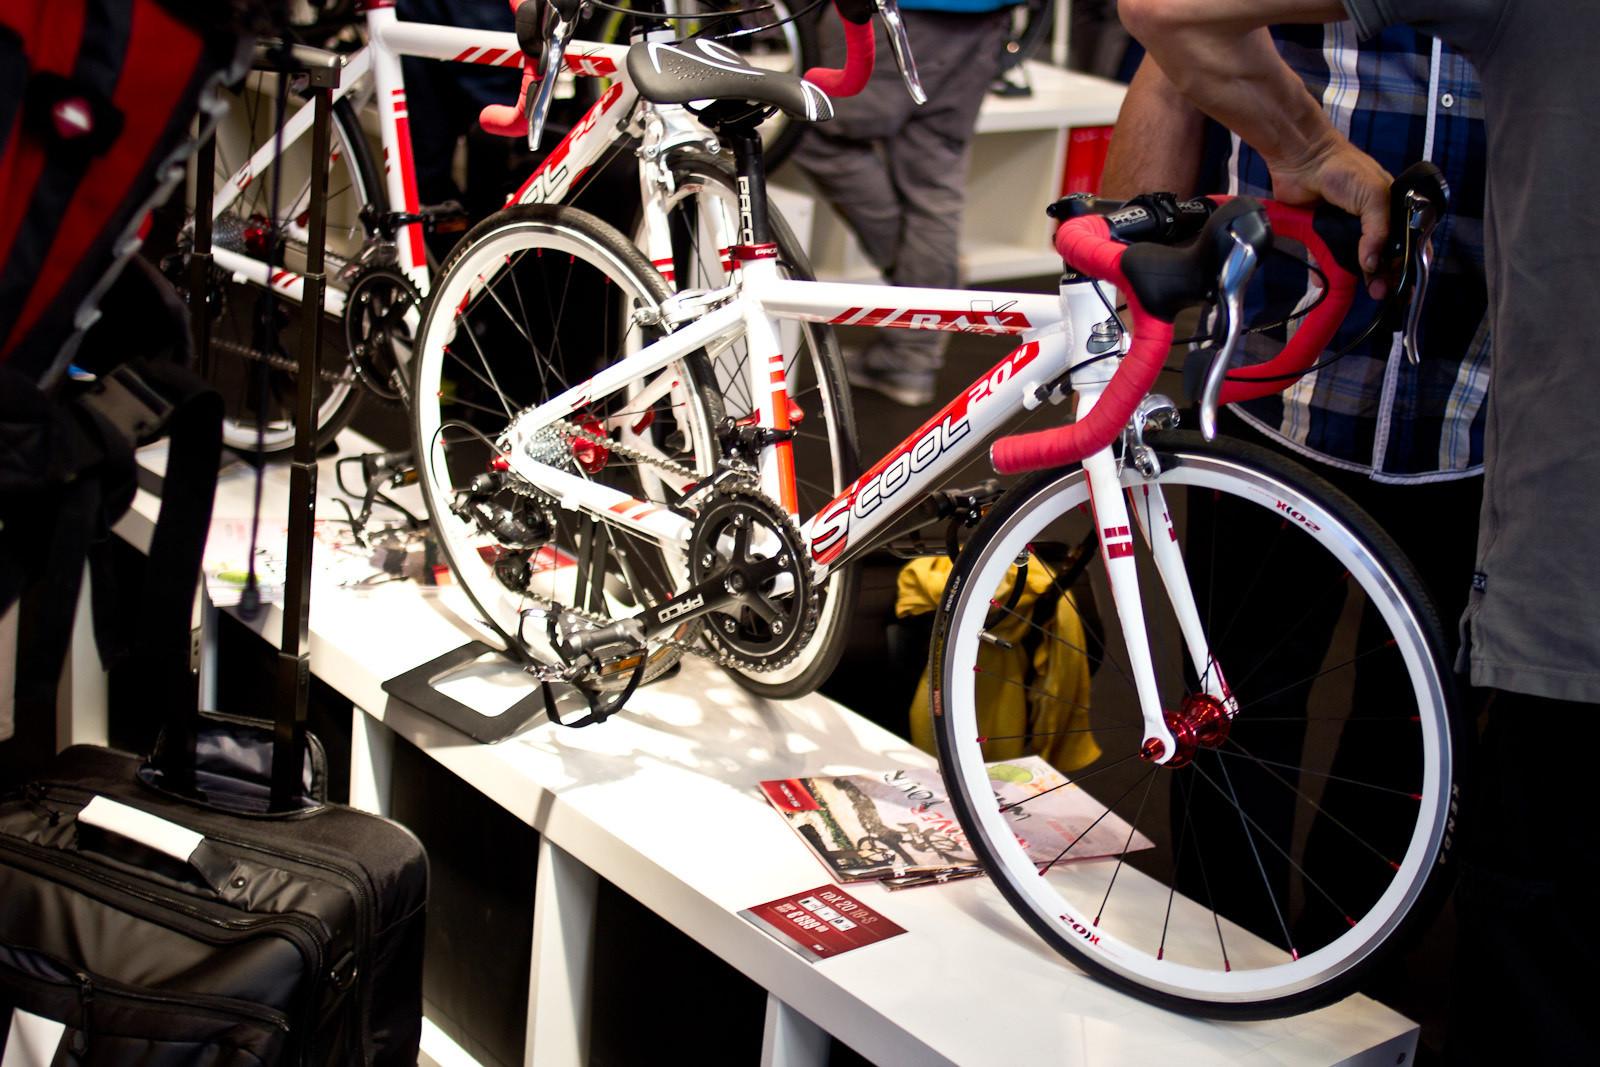 S'COOL raX Kid's Road Bike - 2014 Kids Bikes at Eurobike 2013 - Mountain Biking Pictures - Vital MTB